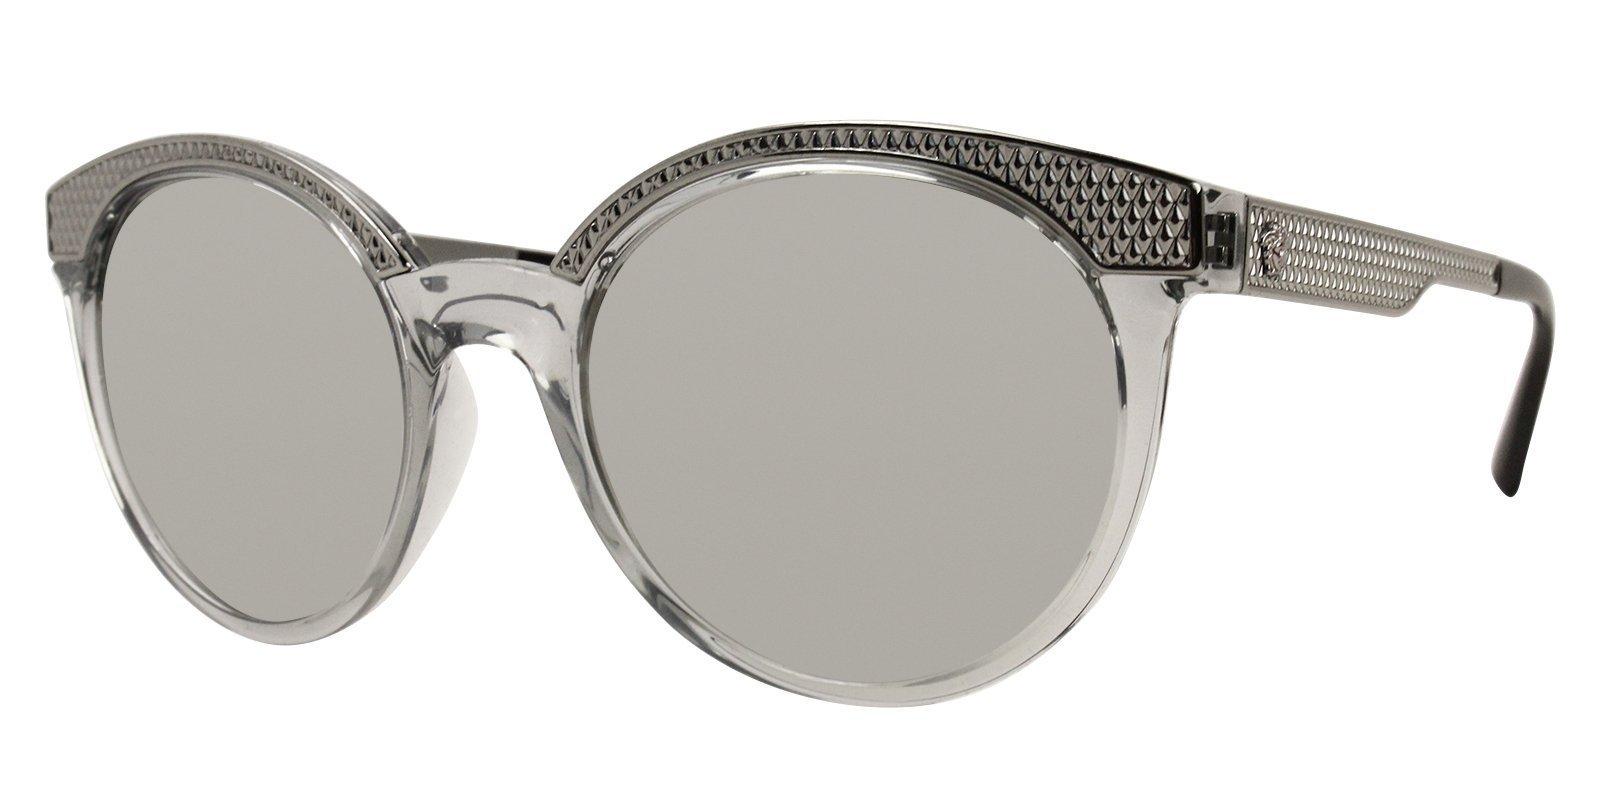 787827bc95fc3 Versace - VE4330 Silver - Silver-sunglasses-Designer Eyes